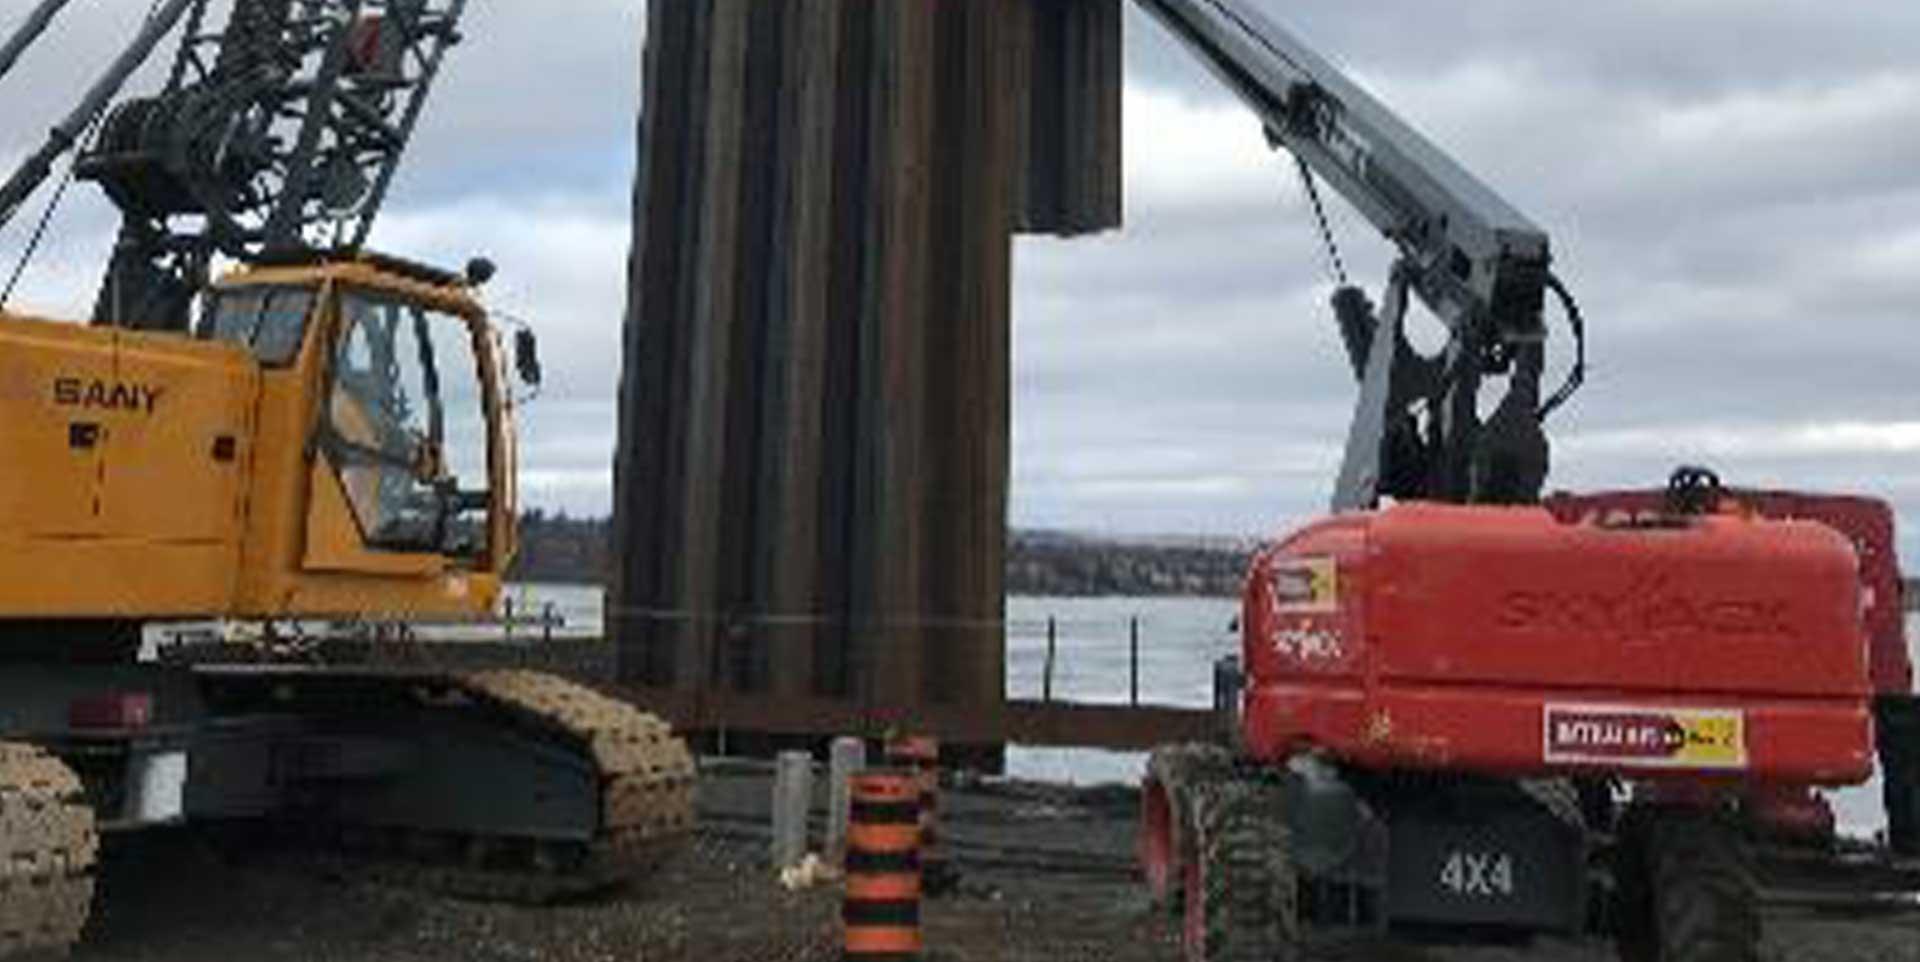 Hamilton Pier 8 Machinery